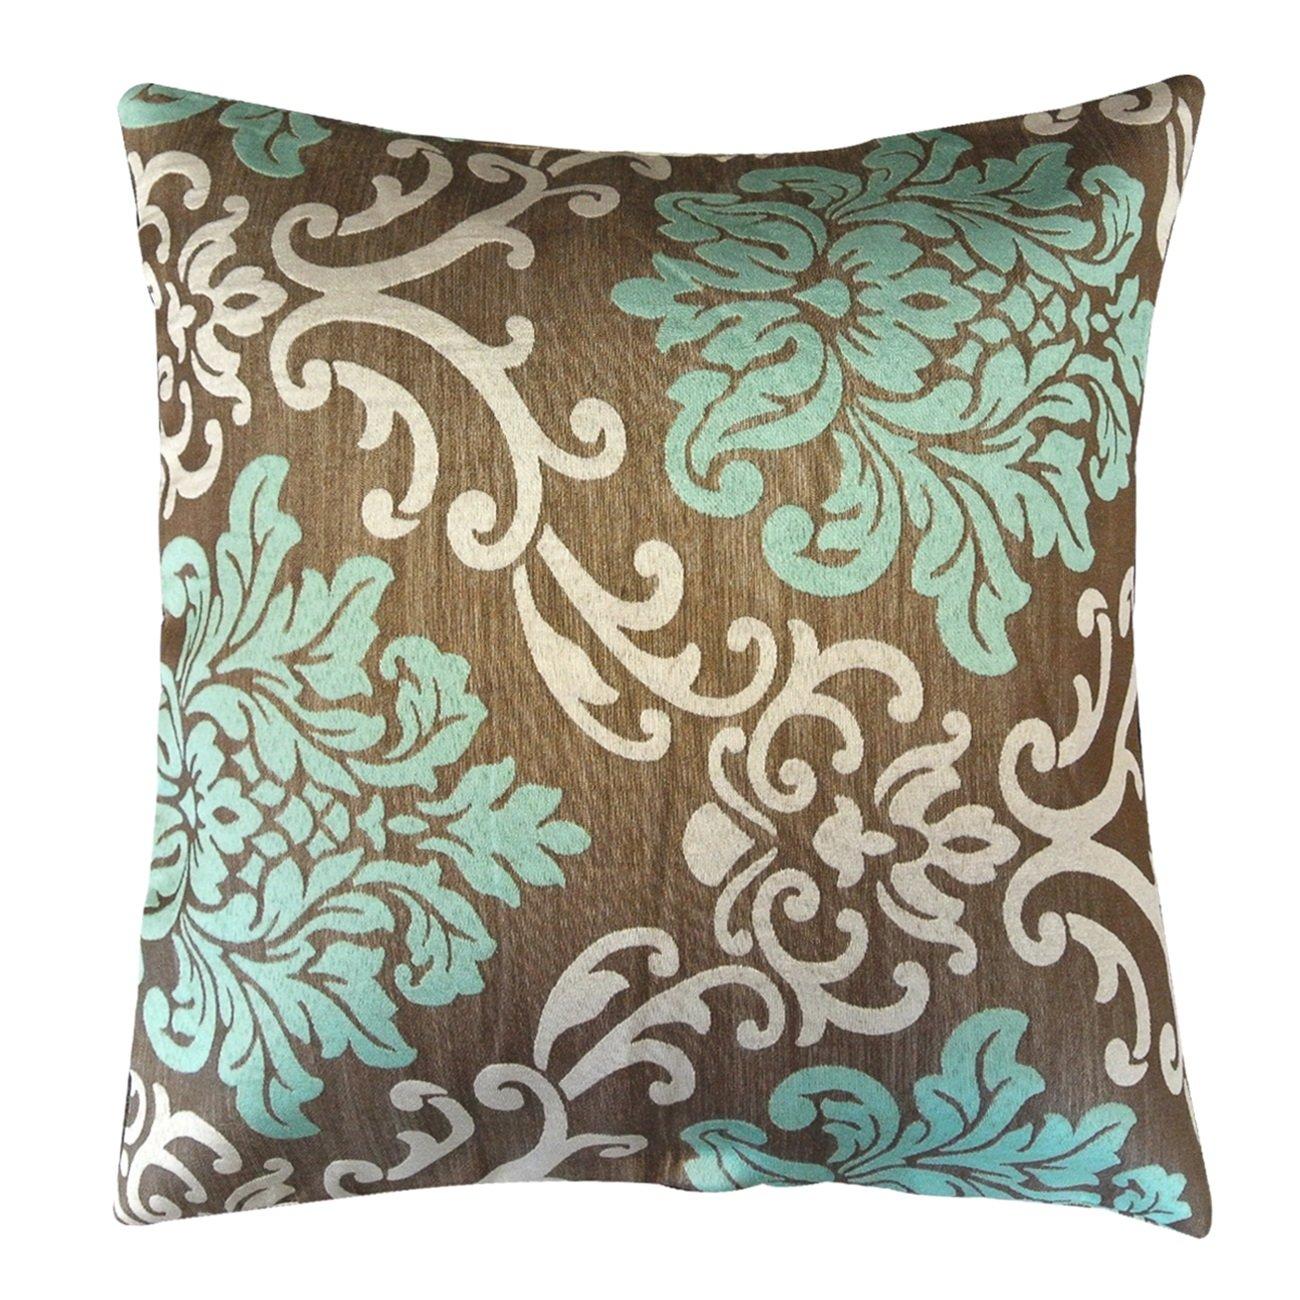 Brown and teal throw pillows - Amazon Com Kella Milla Regal Damask Throw Pillow Cover Grey Magenta Home Kitchen